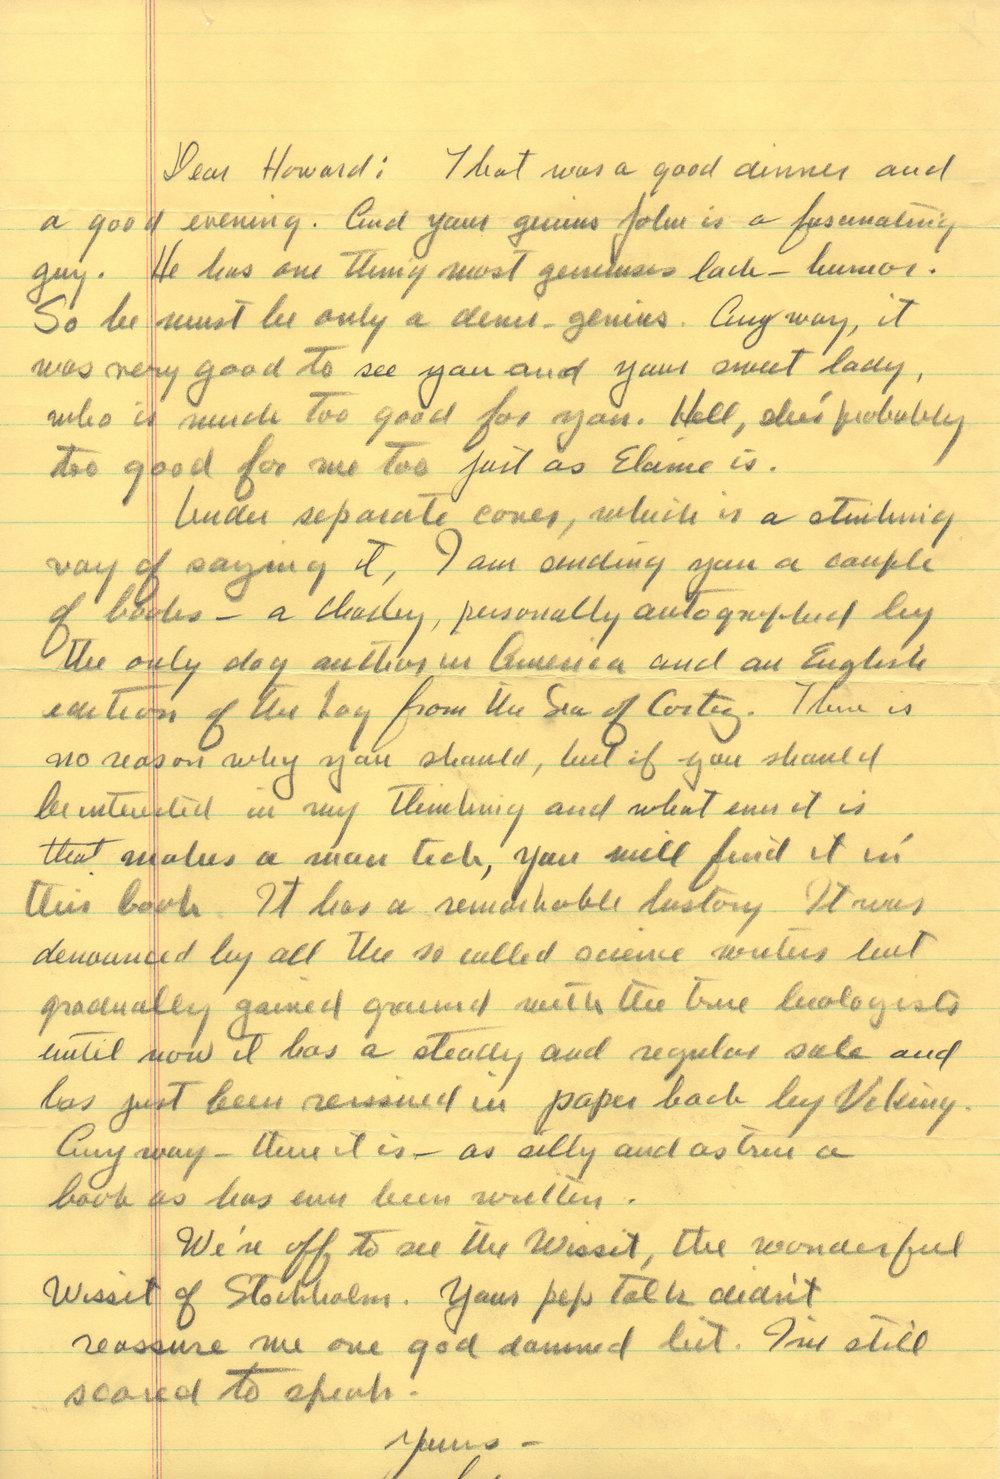 SteinbeckWissithandwritten.jpeg